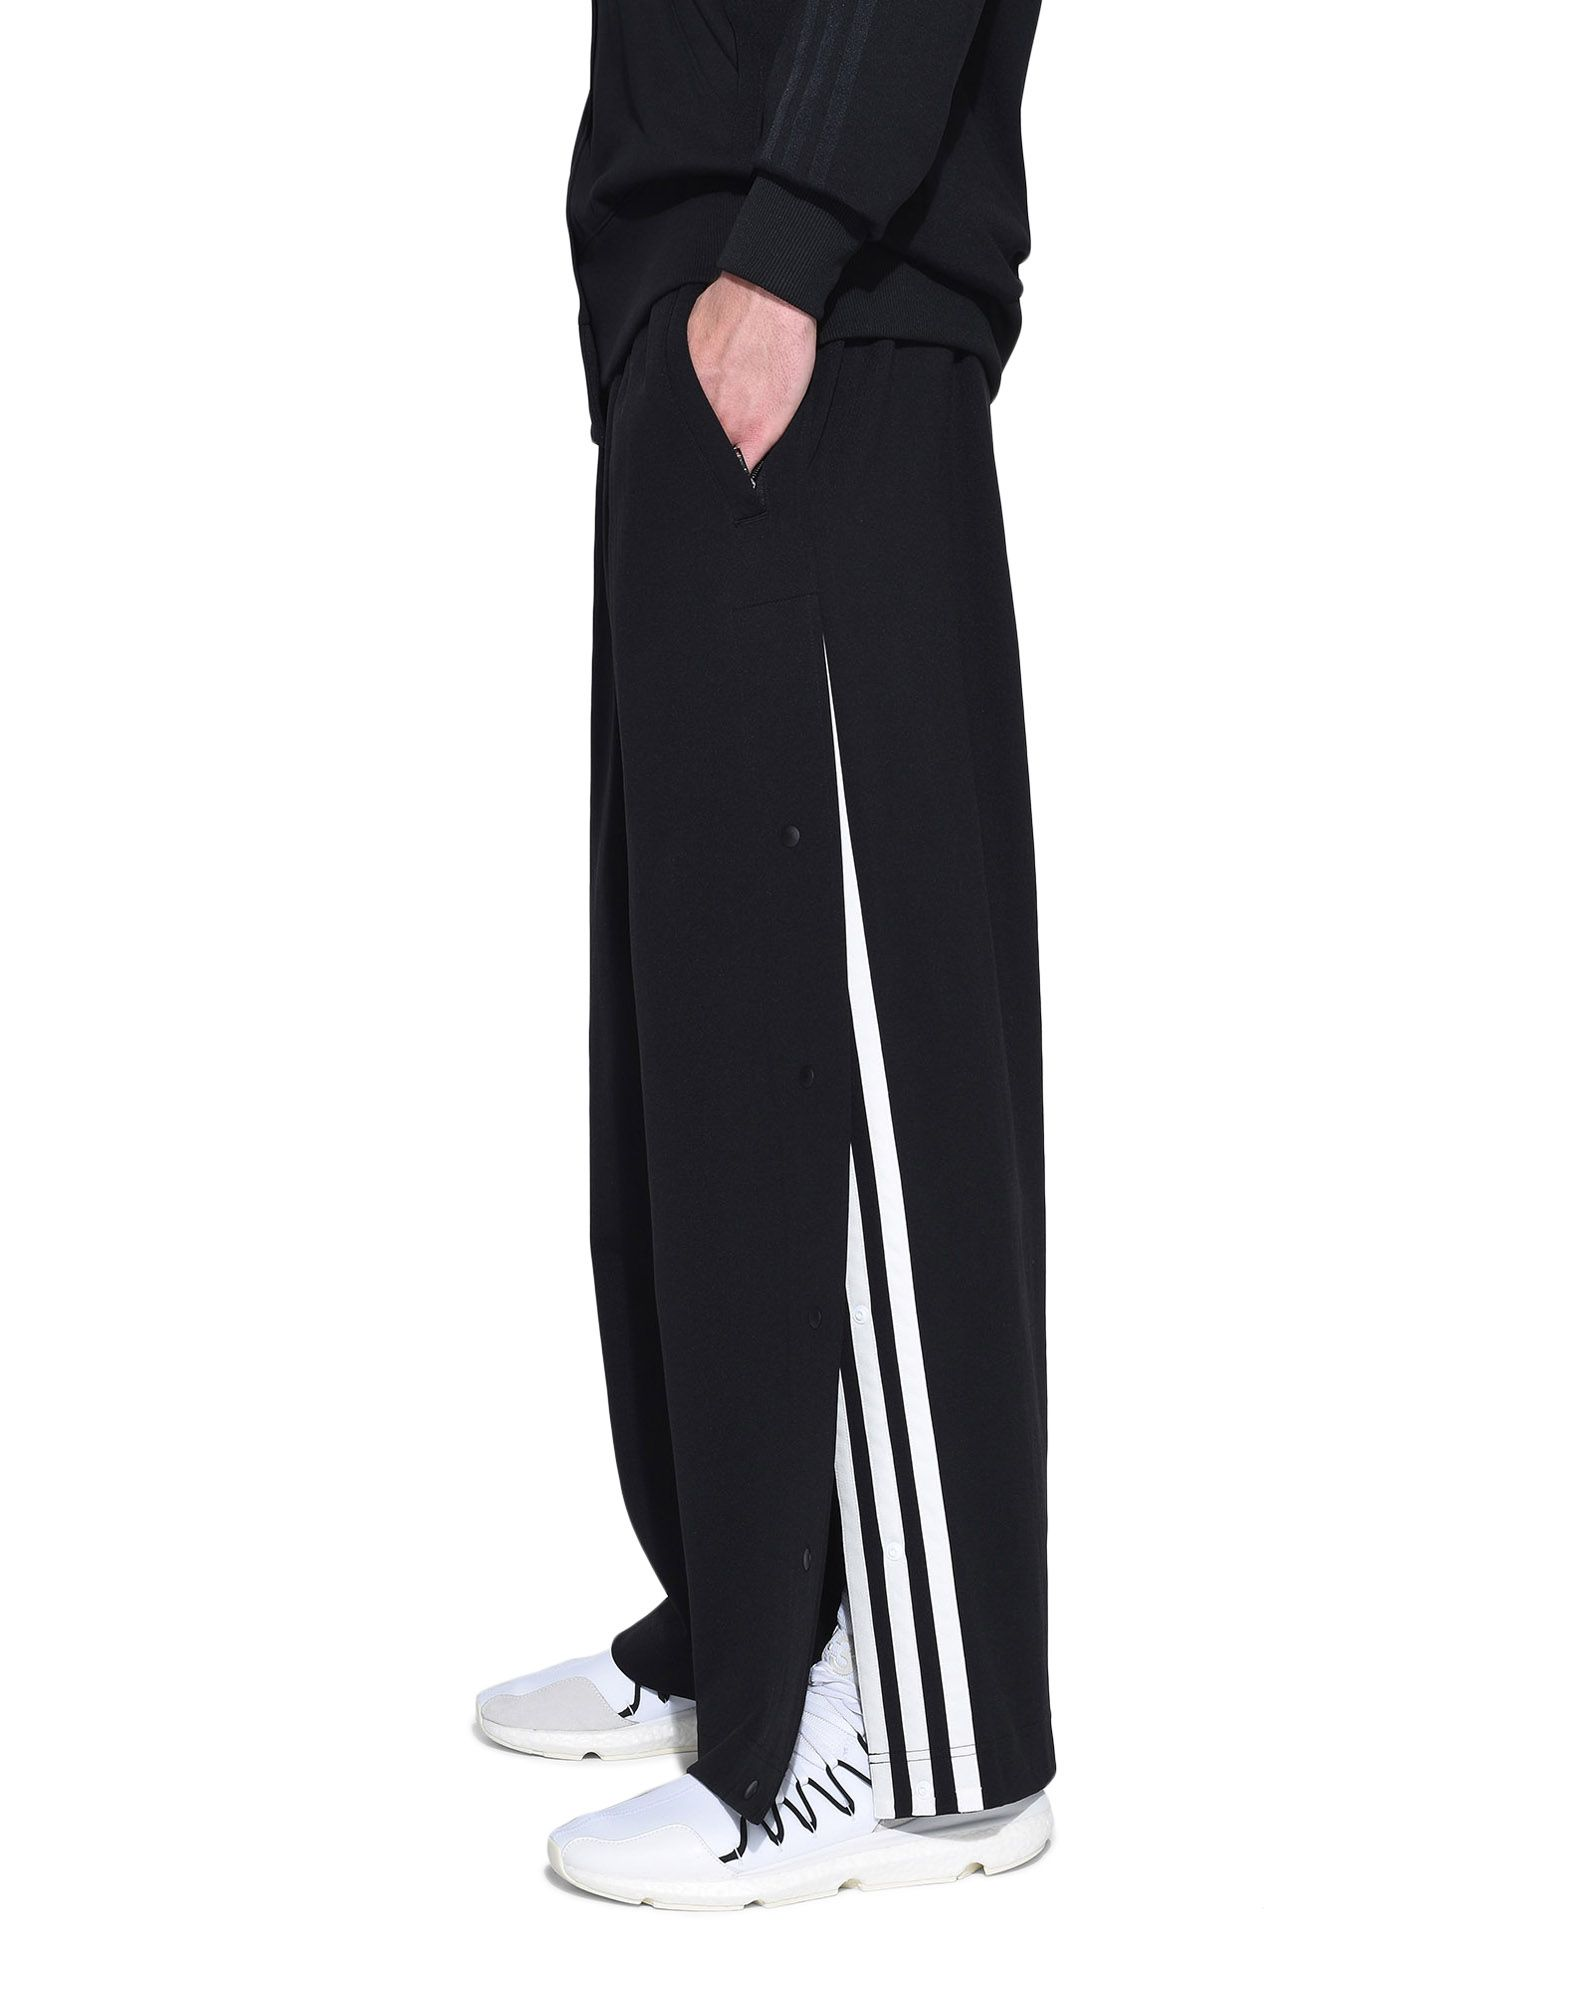 Y-3 Y-3 3-Stripes Matte Snap Track Pants Track pant Man e